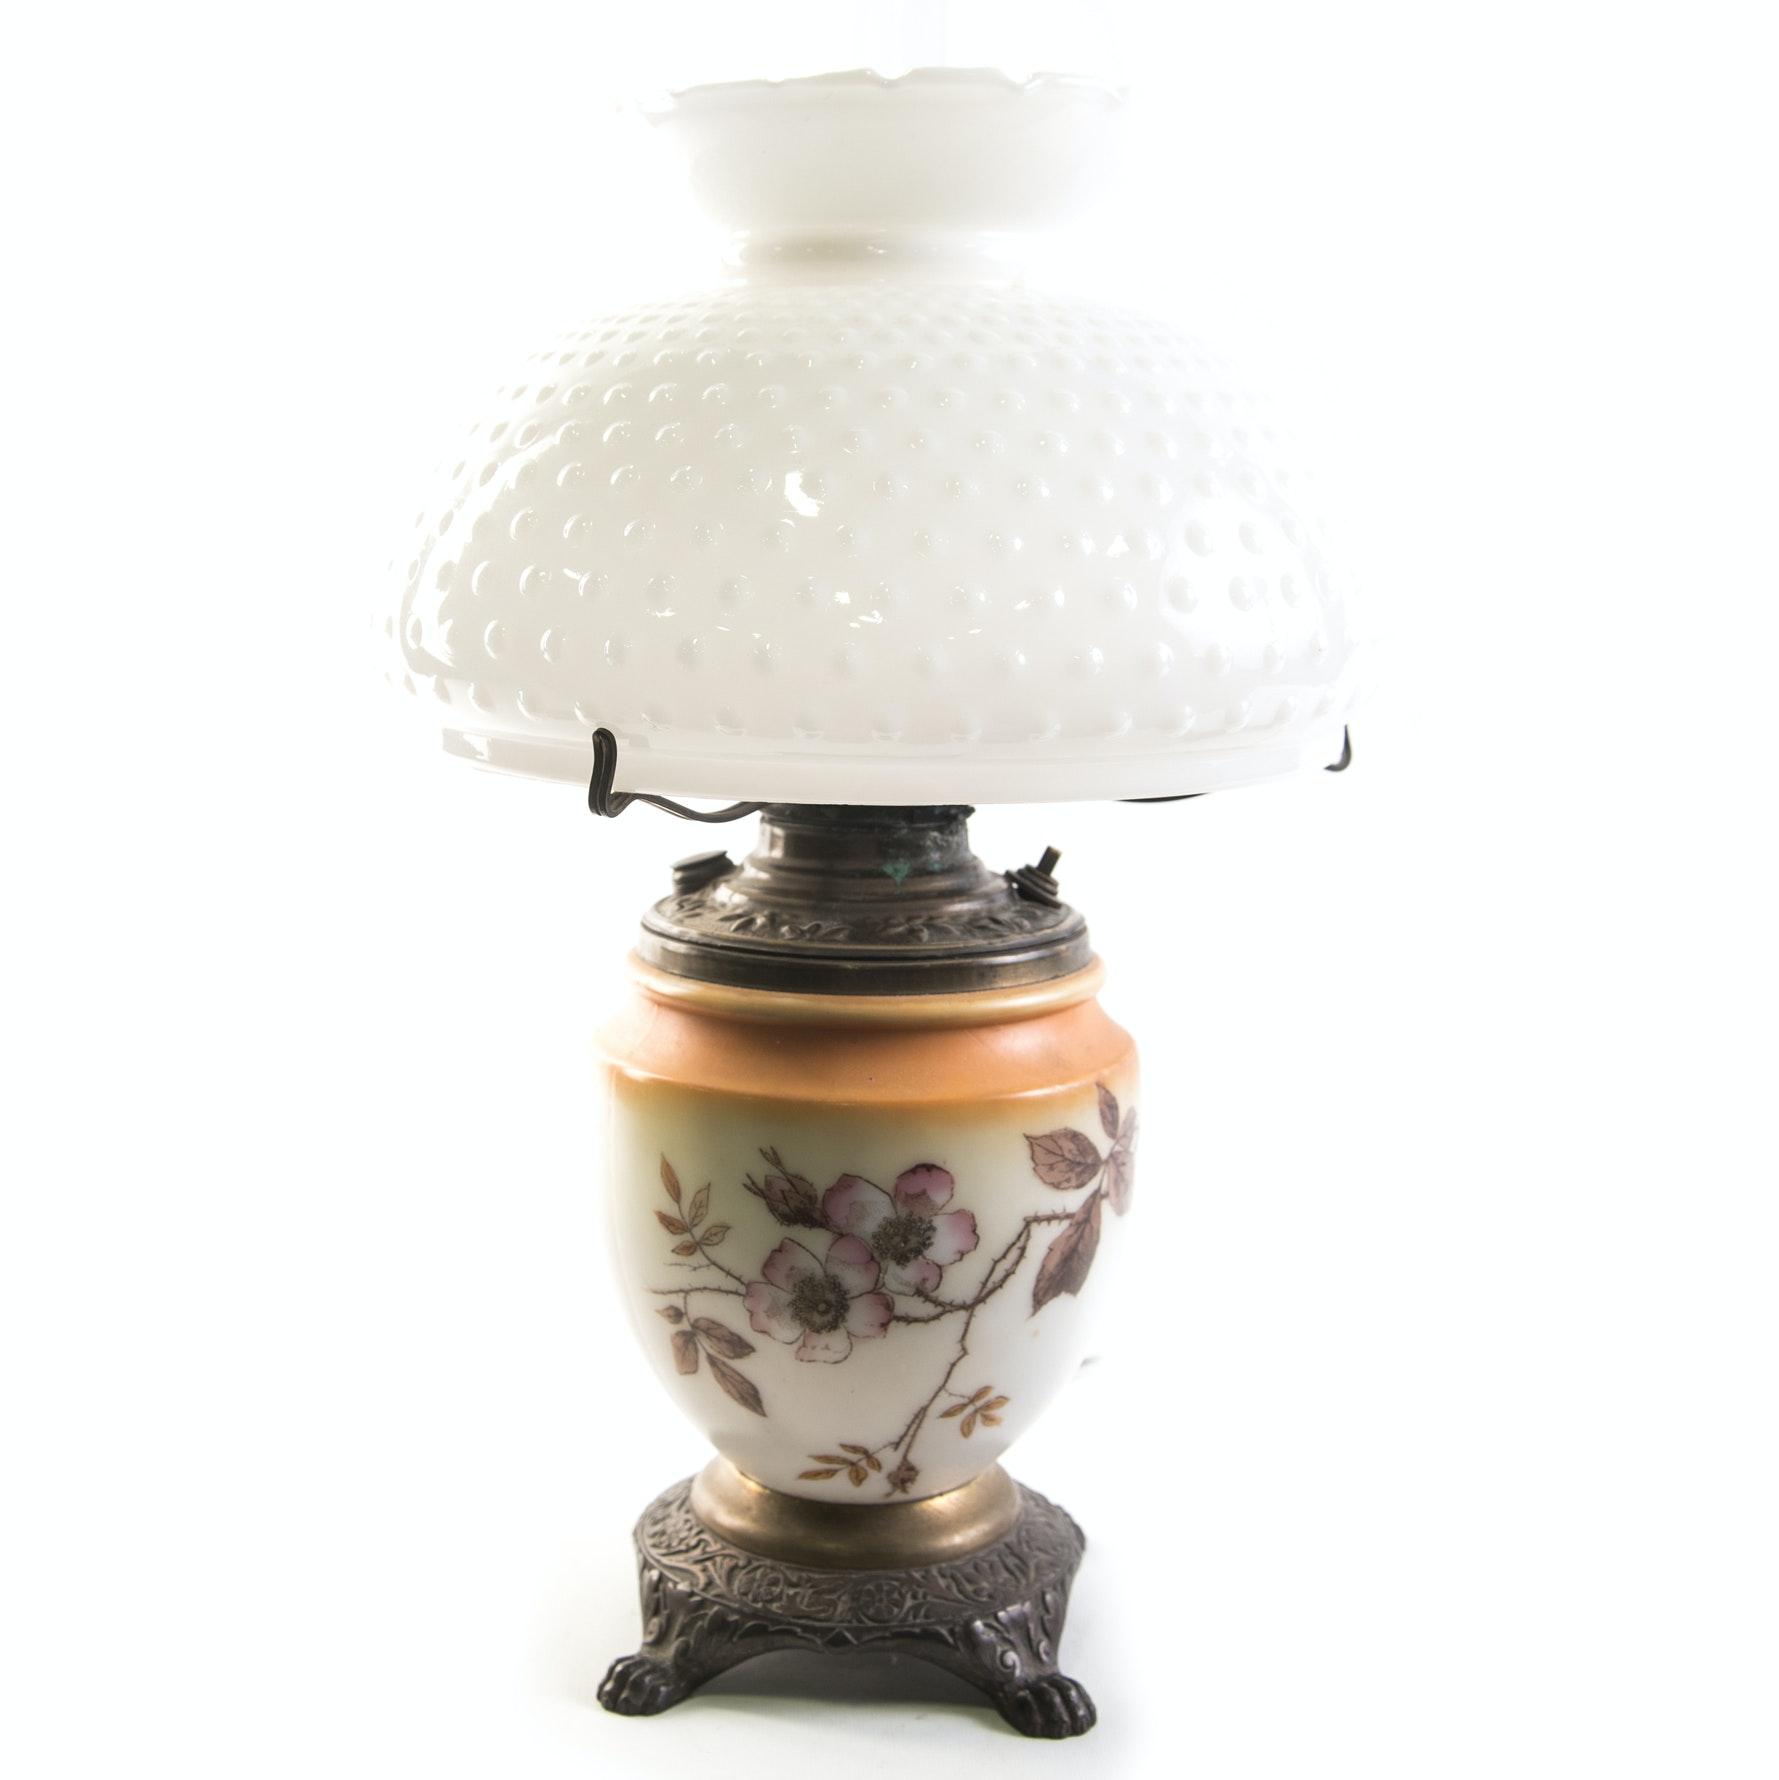 Vintage Converted Electrified Kerosene Parlor Lamp